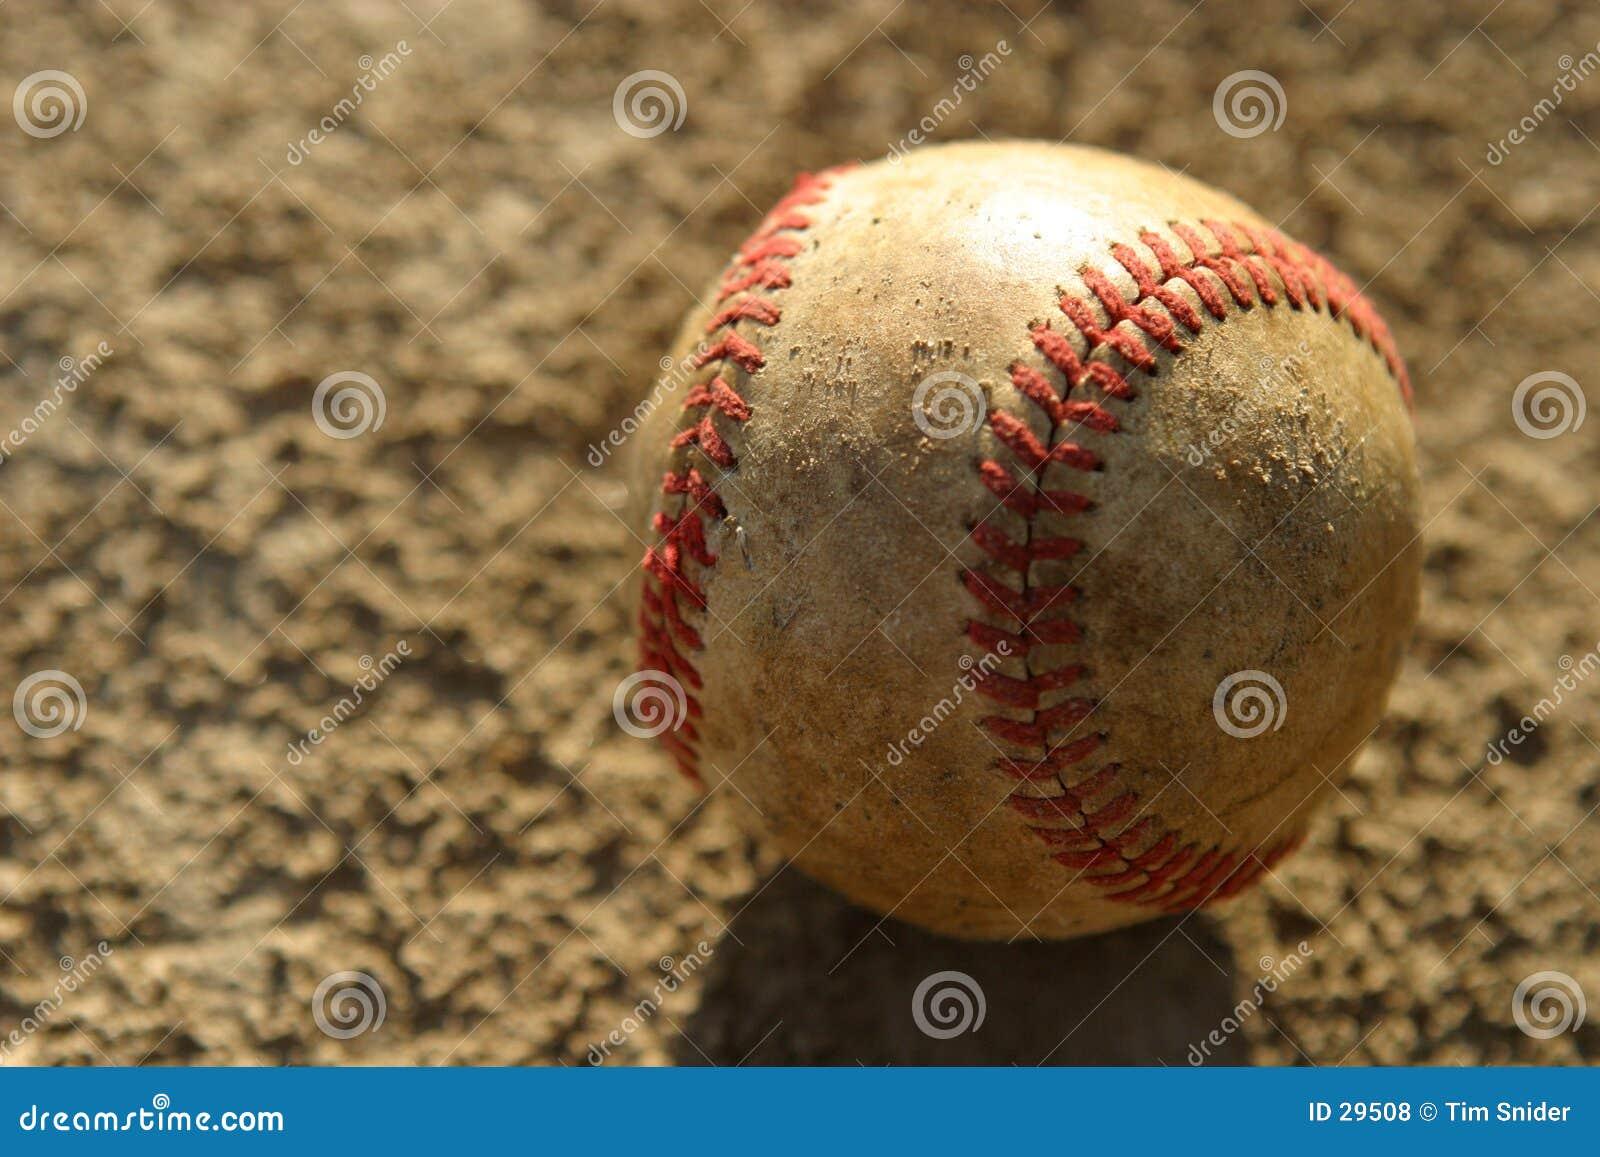 Basebol usado